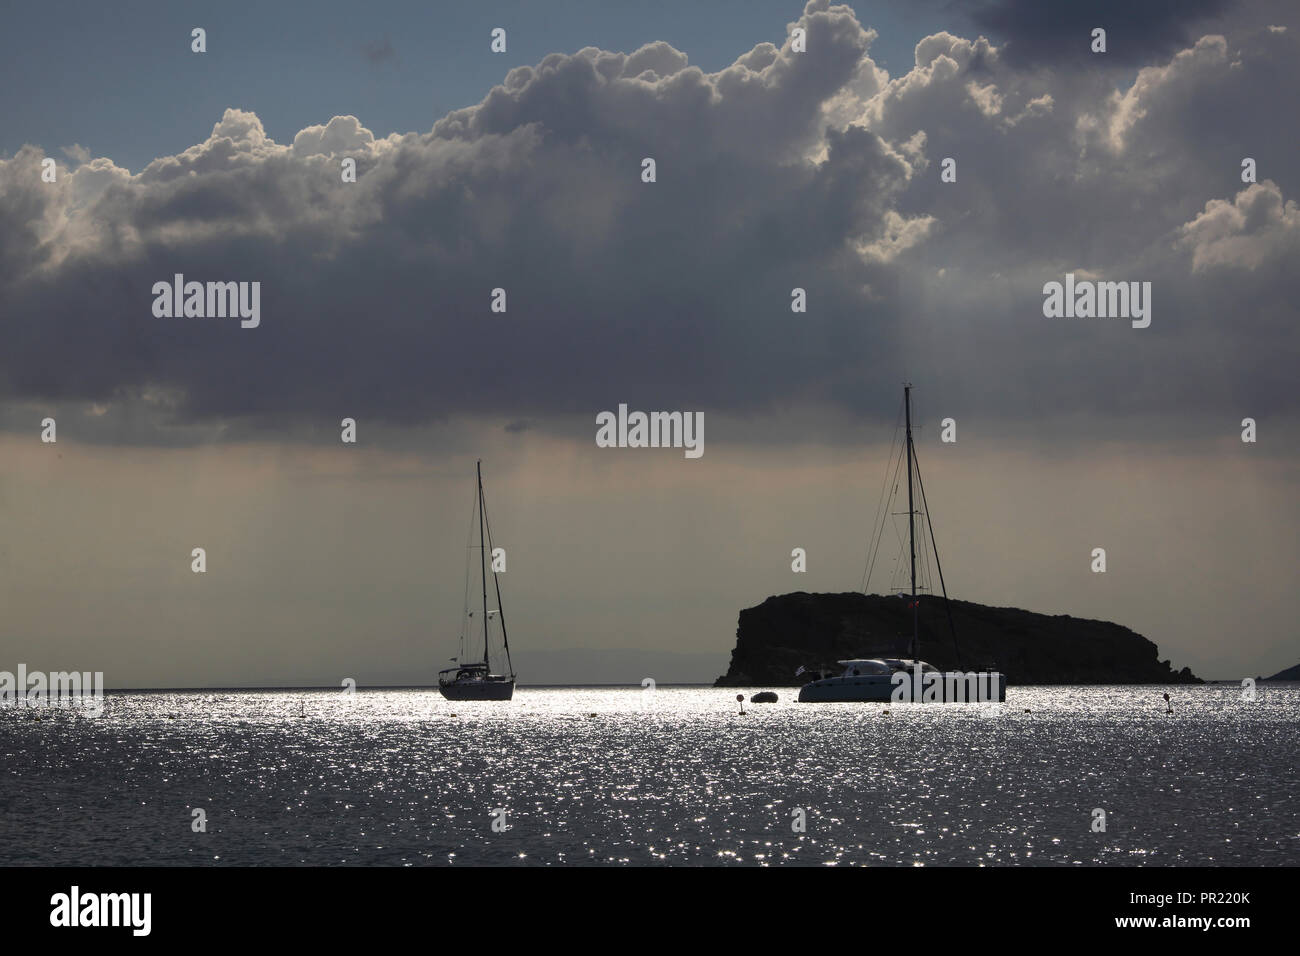 Attica Greece Sounion Beach Anchored Yachts at Sea - Stock Image